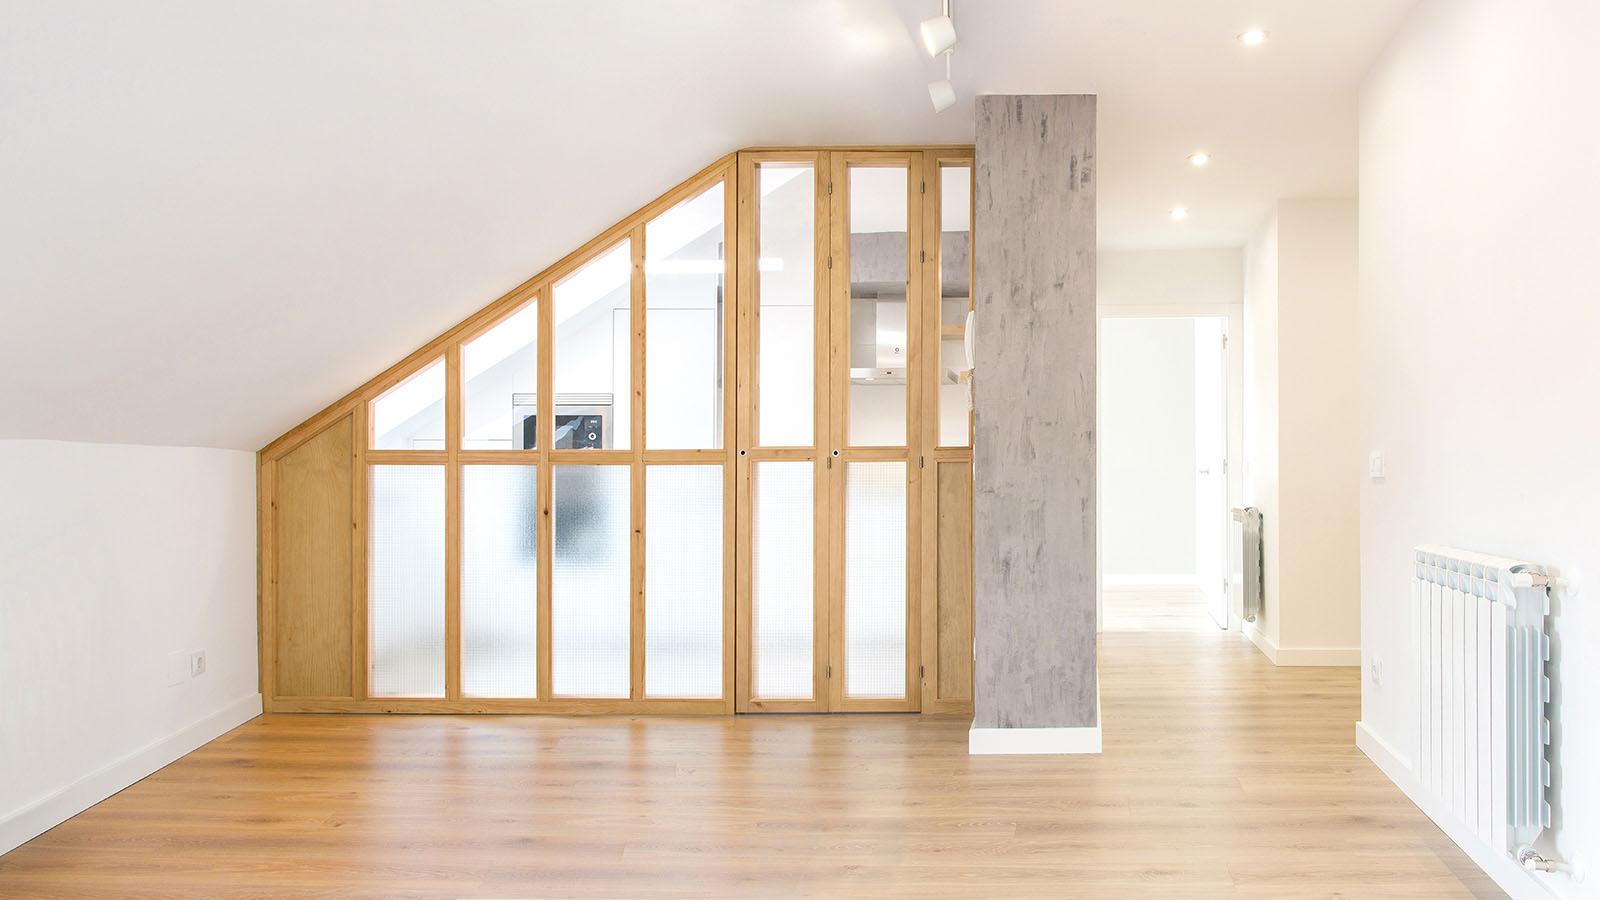 Reforma vivienda EA. Cristalera madera